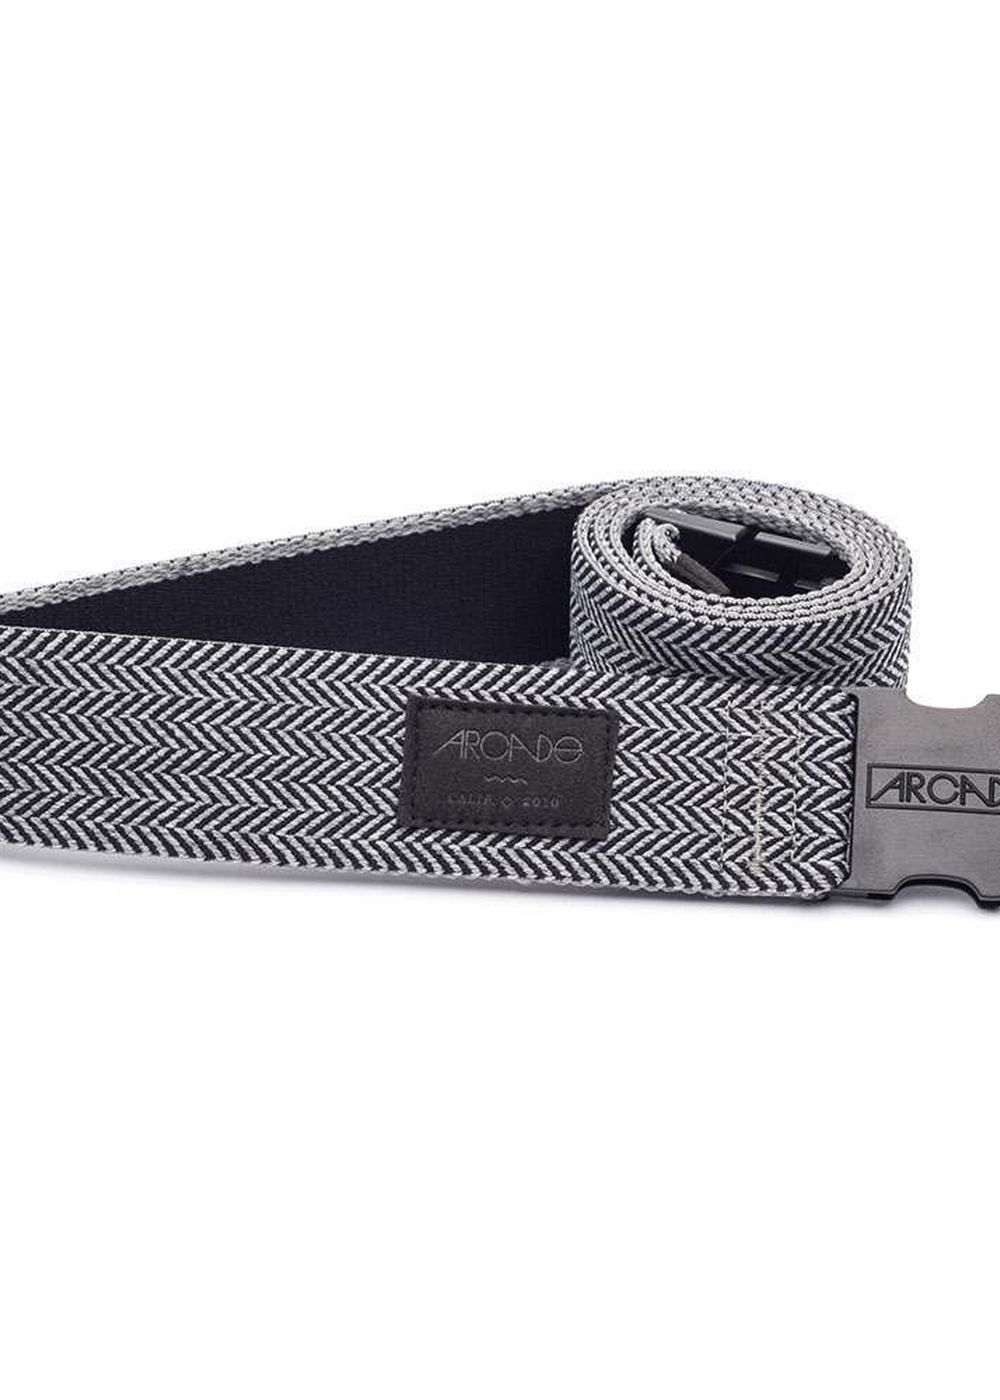 arcade belts the hemingway heather grey